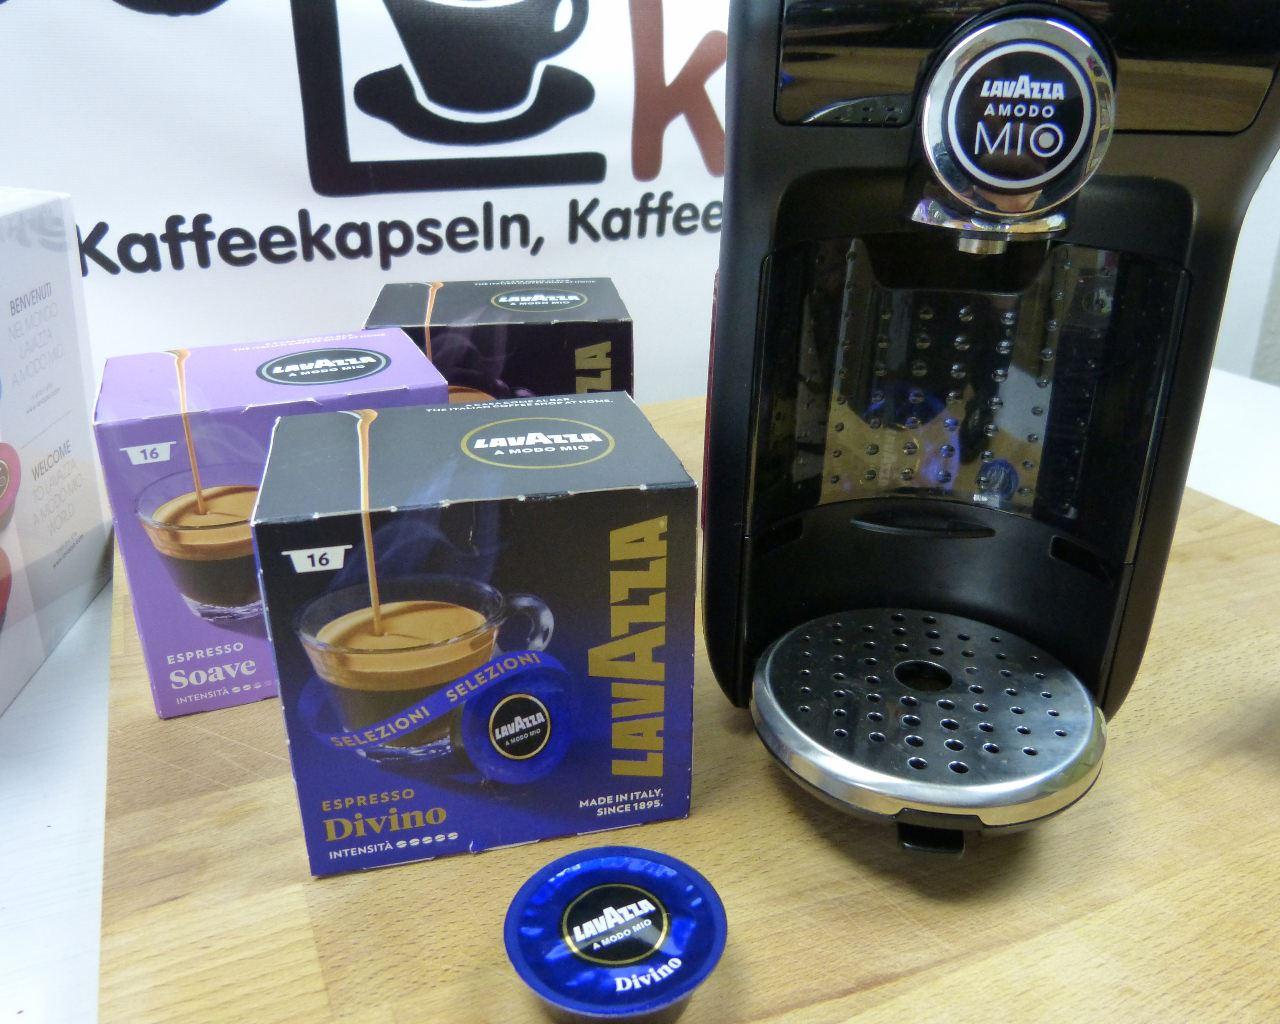 Aeg Lavazza Magia A Modo Mio Im Test Kapsel Kaffee Net